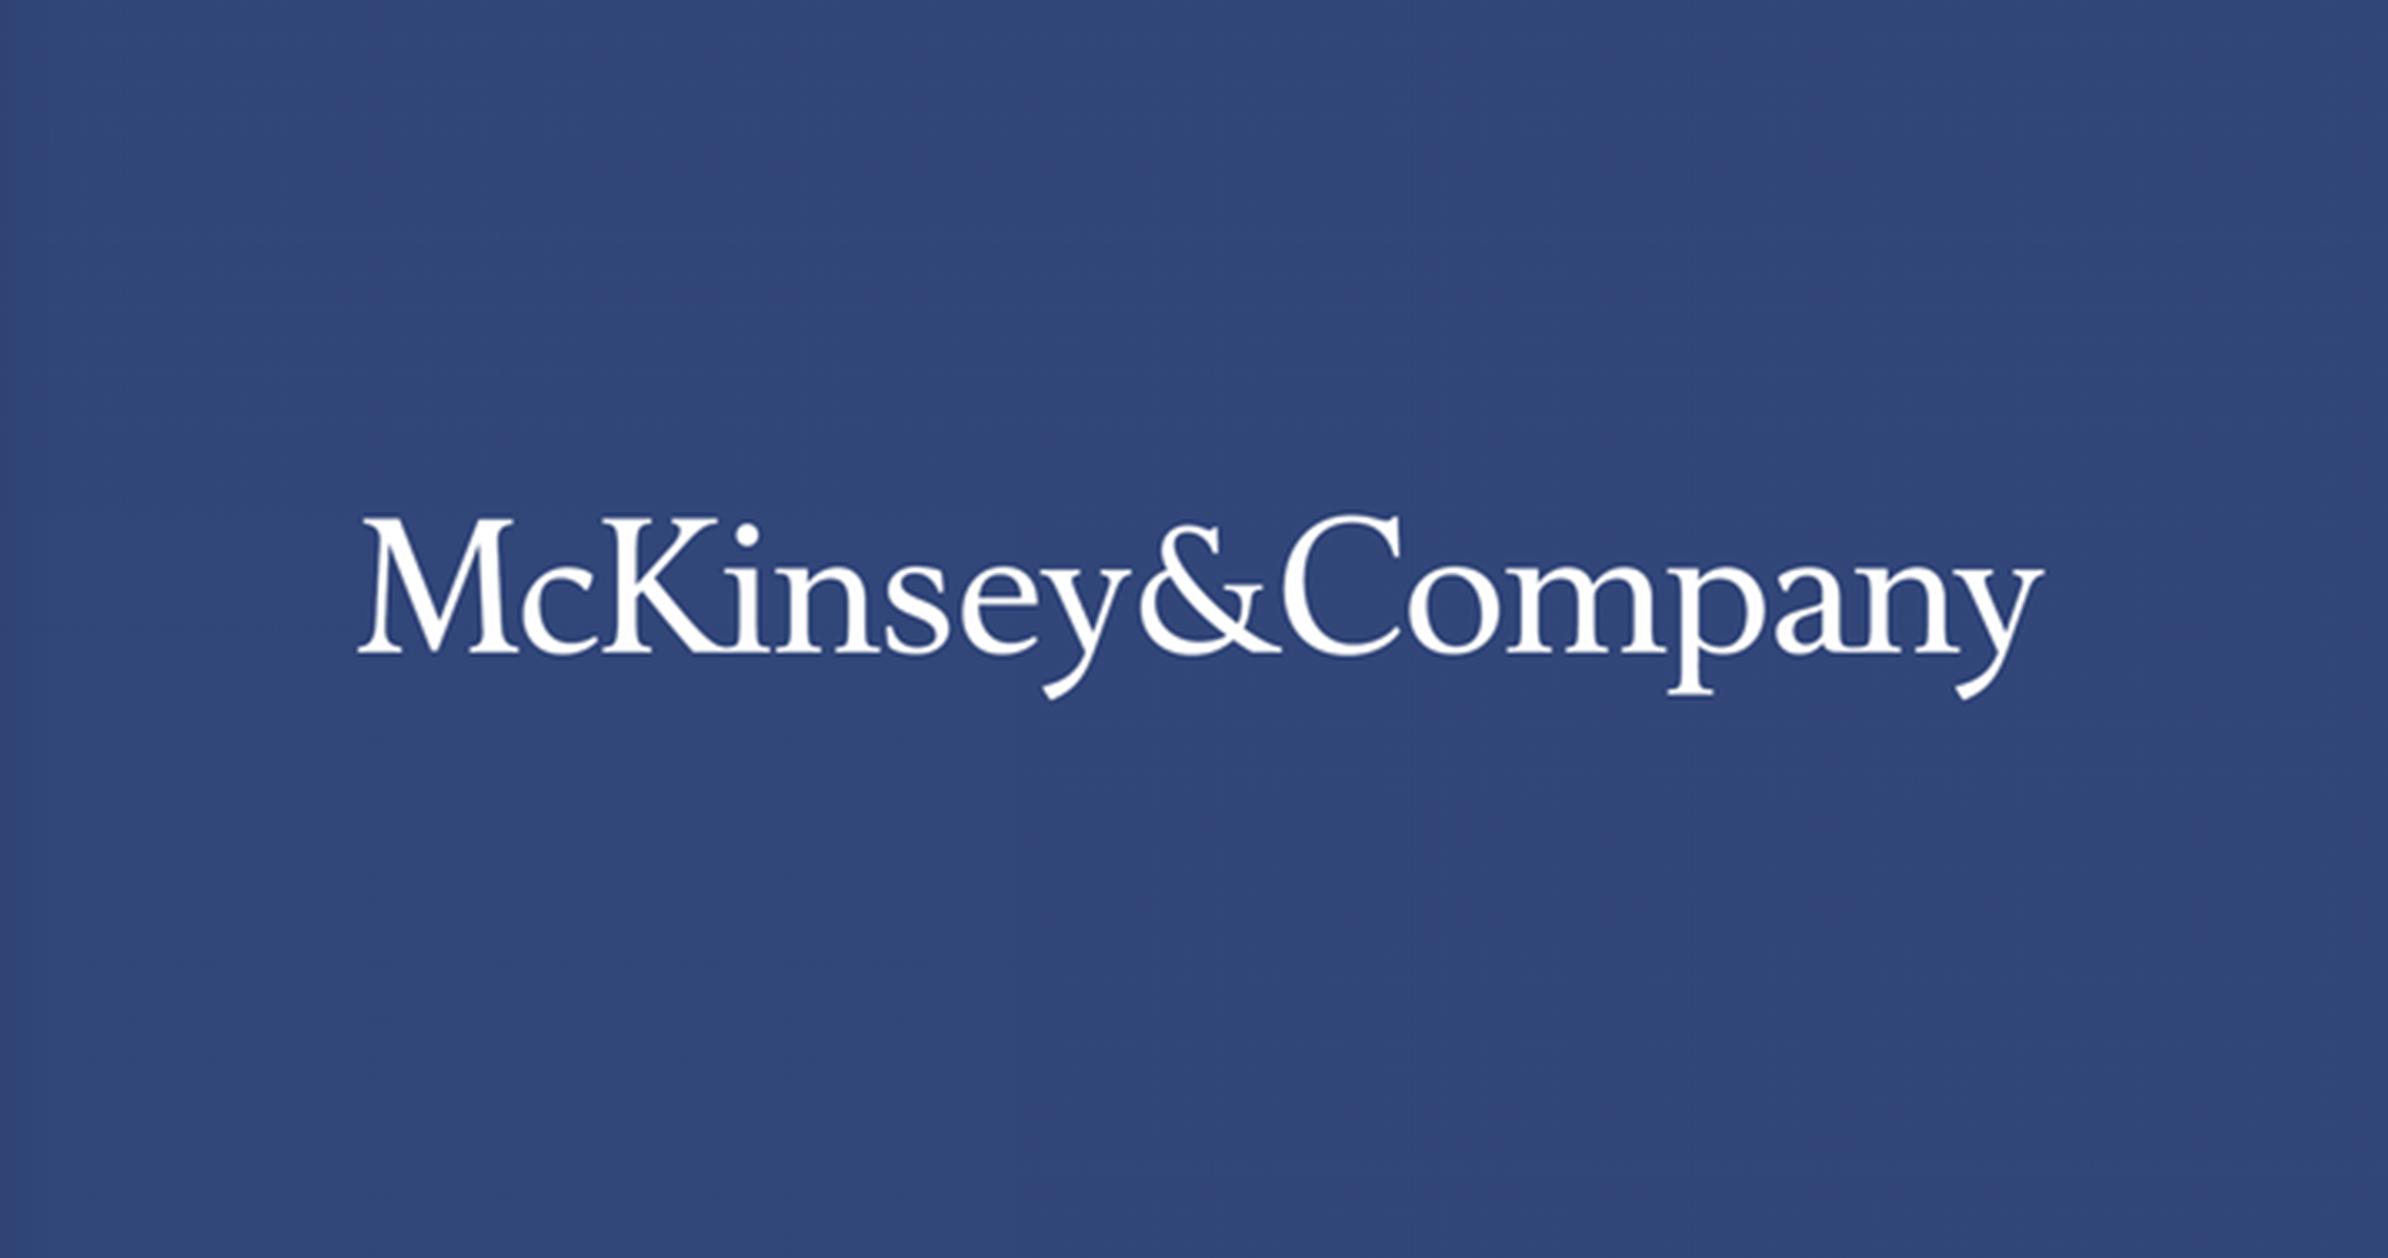 McKinsey Company logo 3